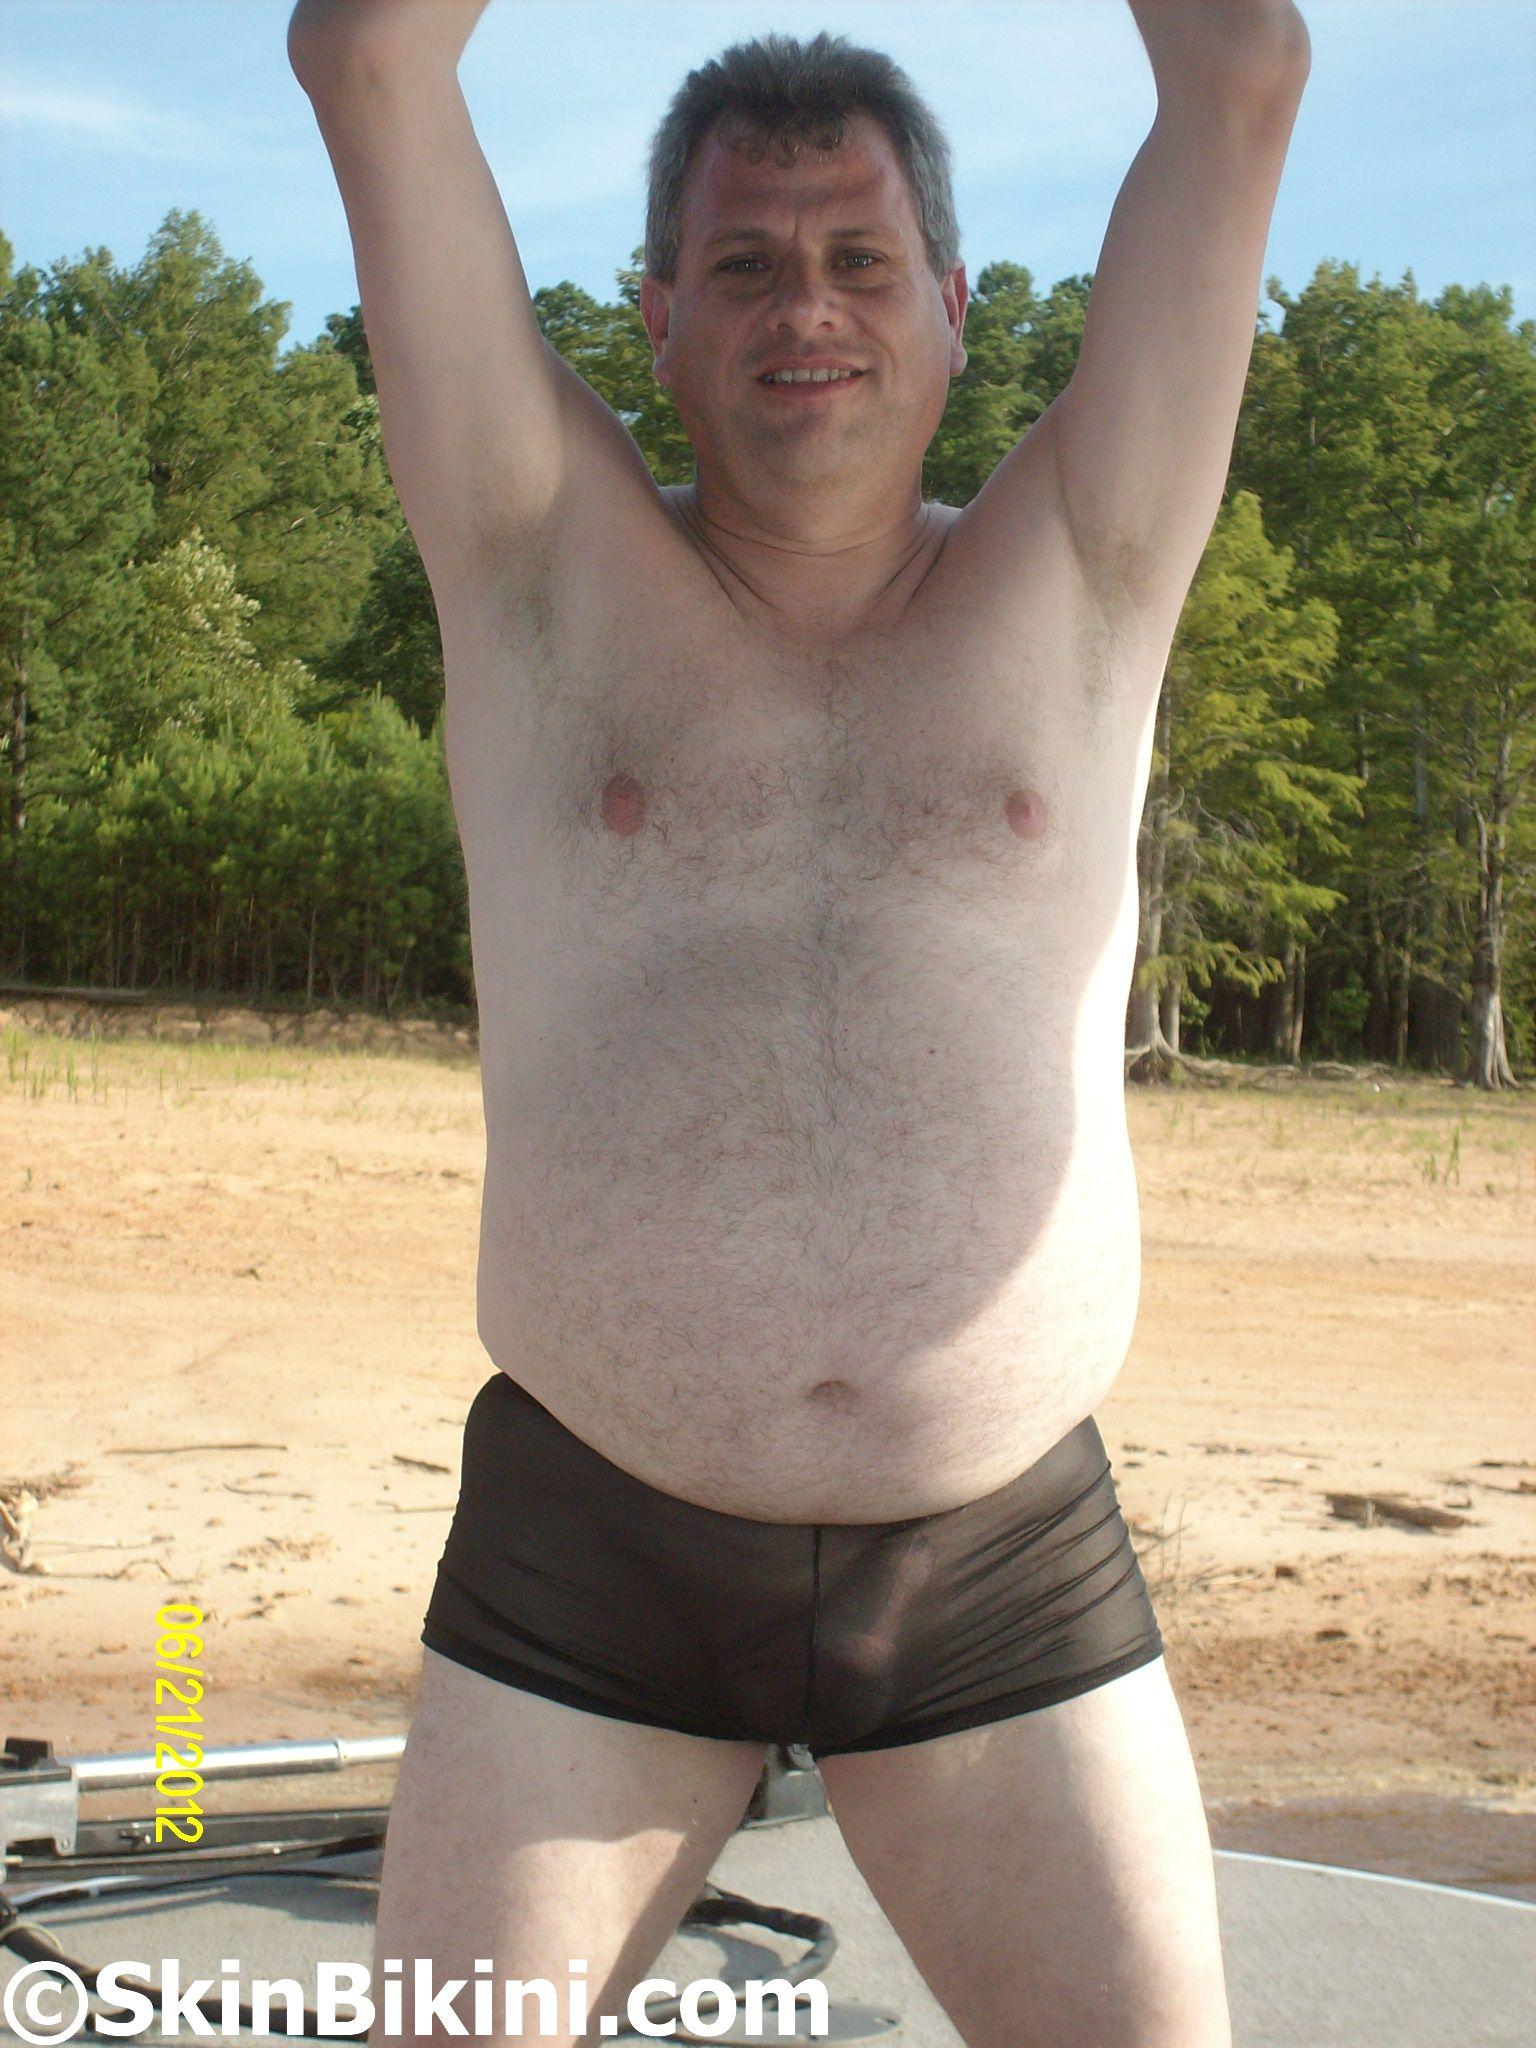 Men in sexy micro scrunch back bikini by skinbikini.com